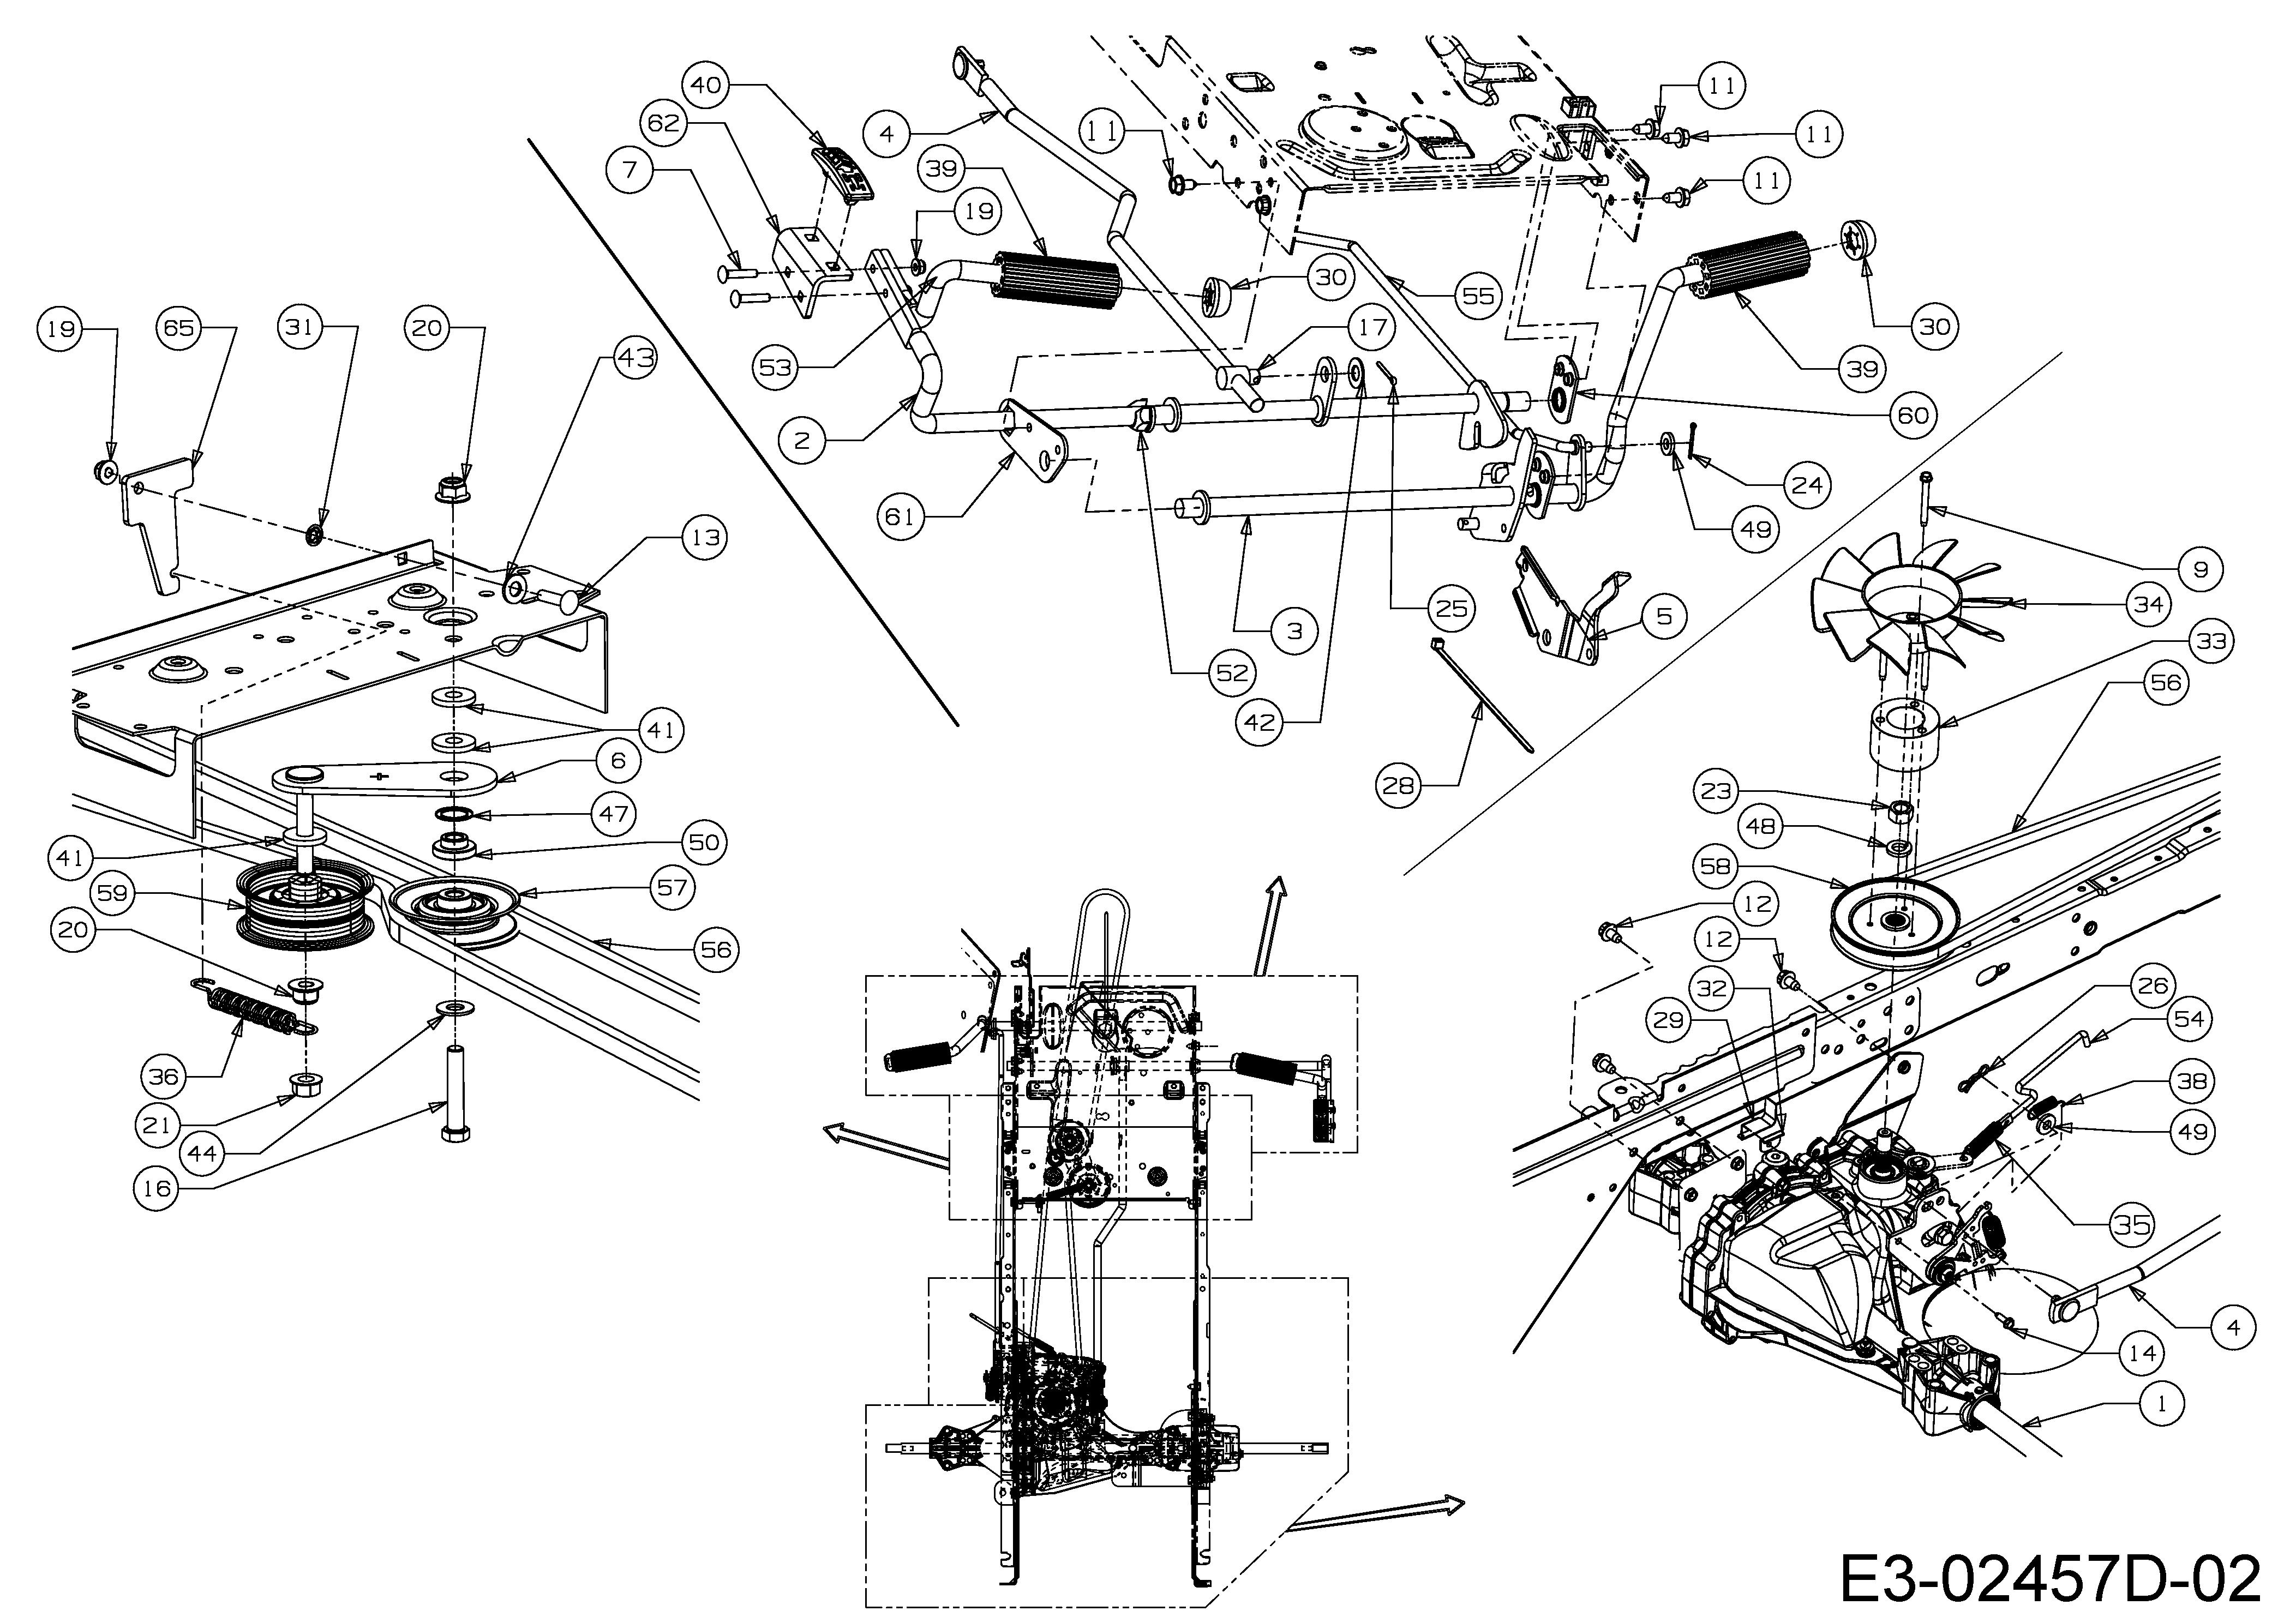 Keilriemen Messerantrieb Original Ersatzteil Cub Cadet Traktor CC1023 HNK